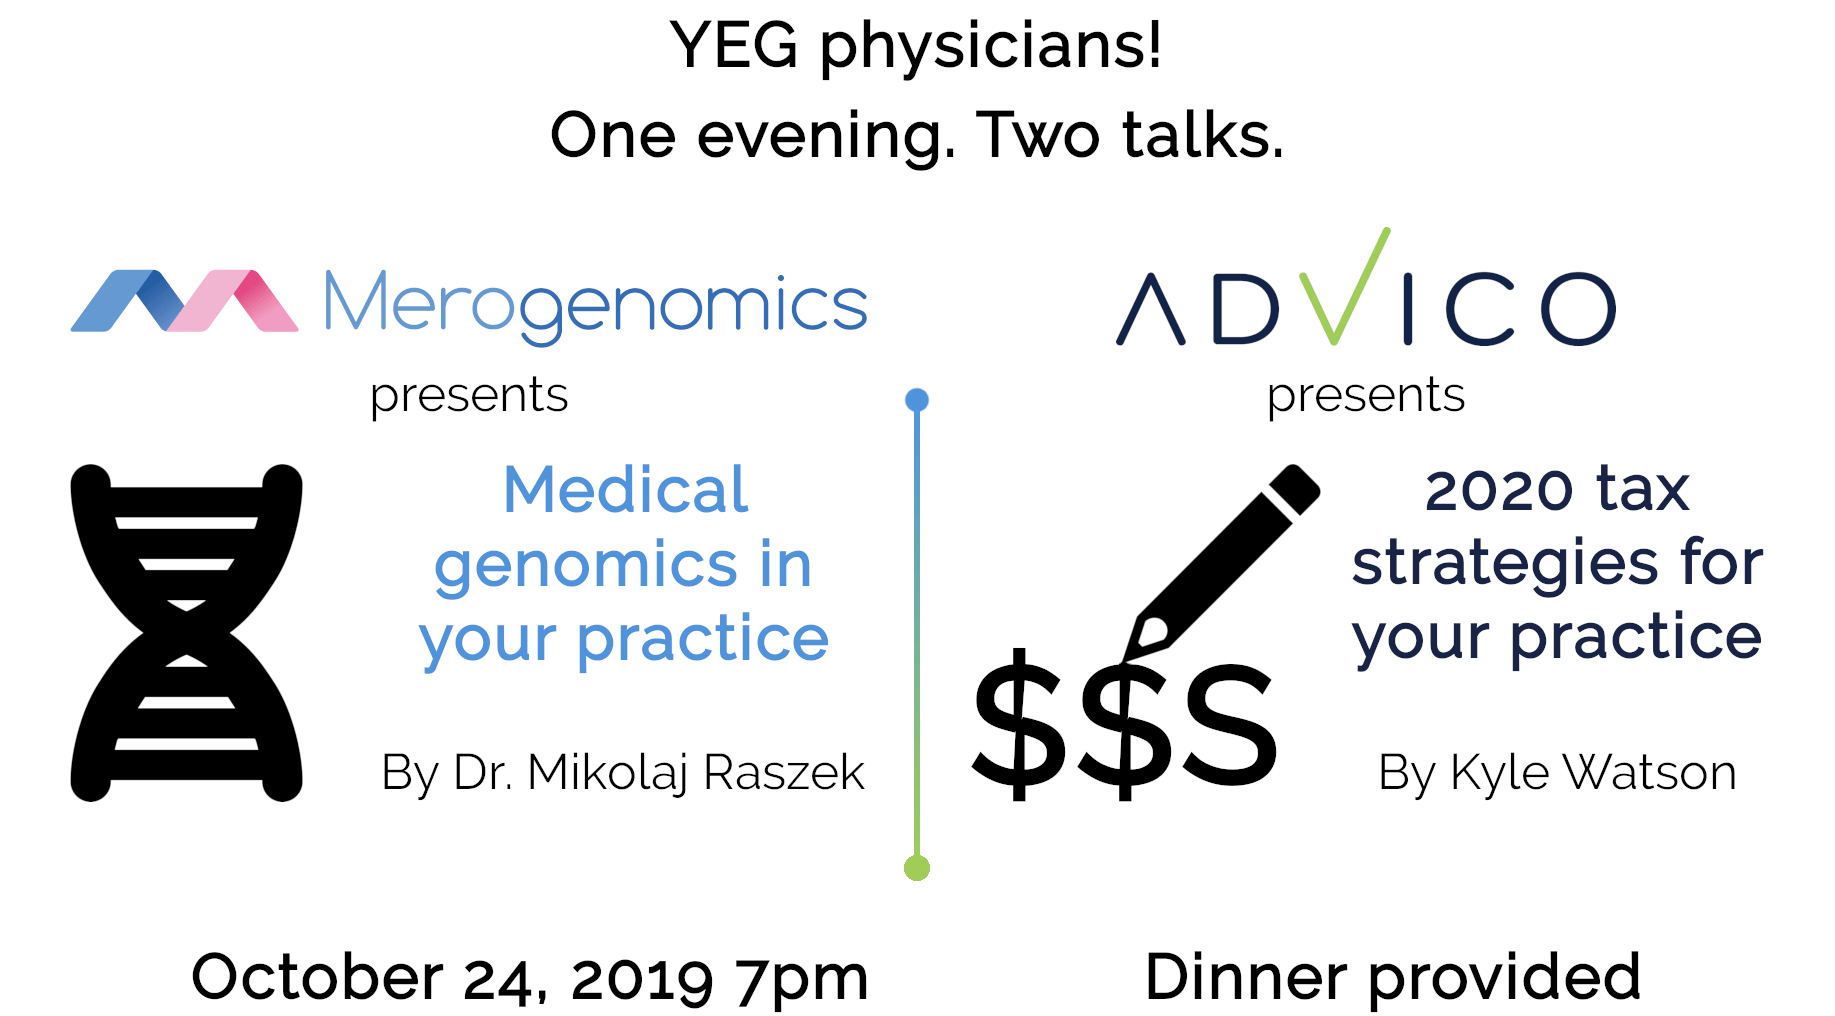 Image of Physicians seminar October 24 2019 Eventbrite cover